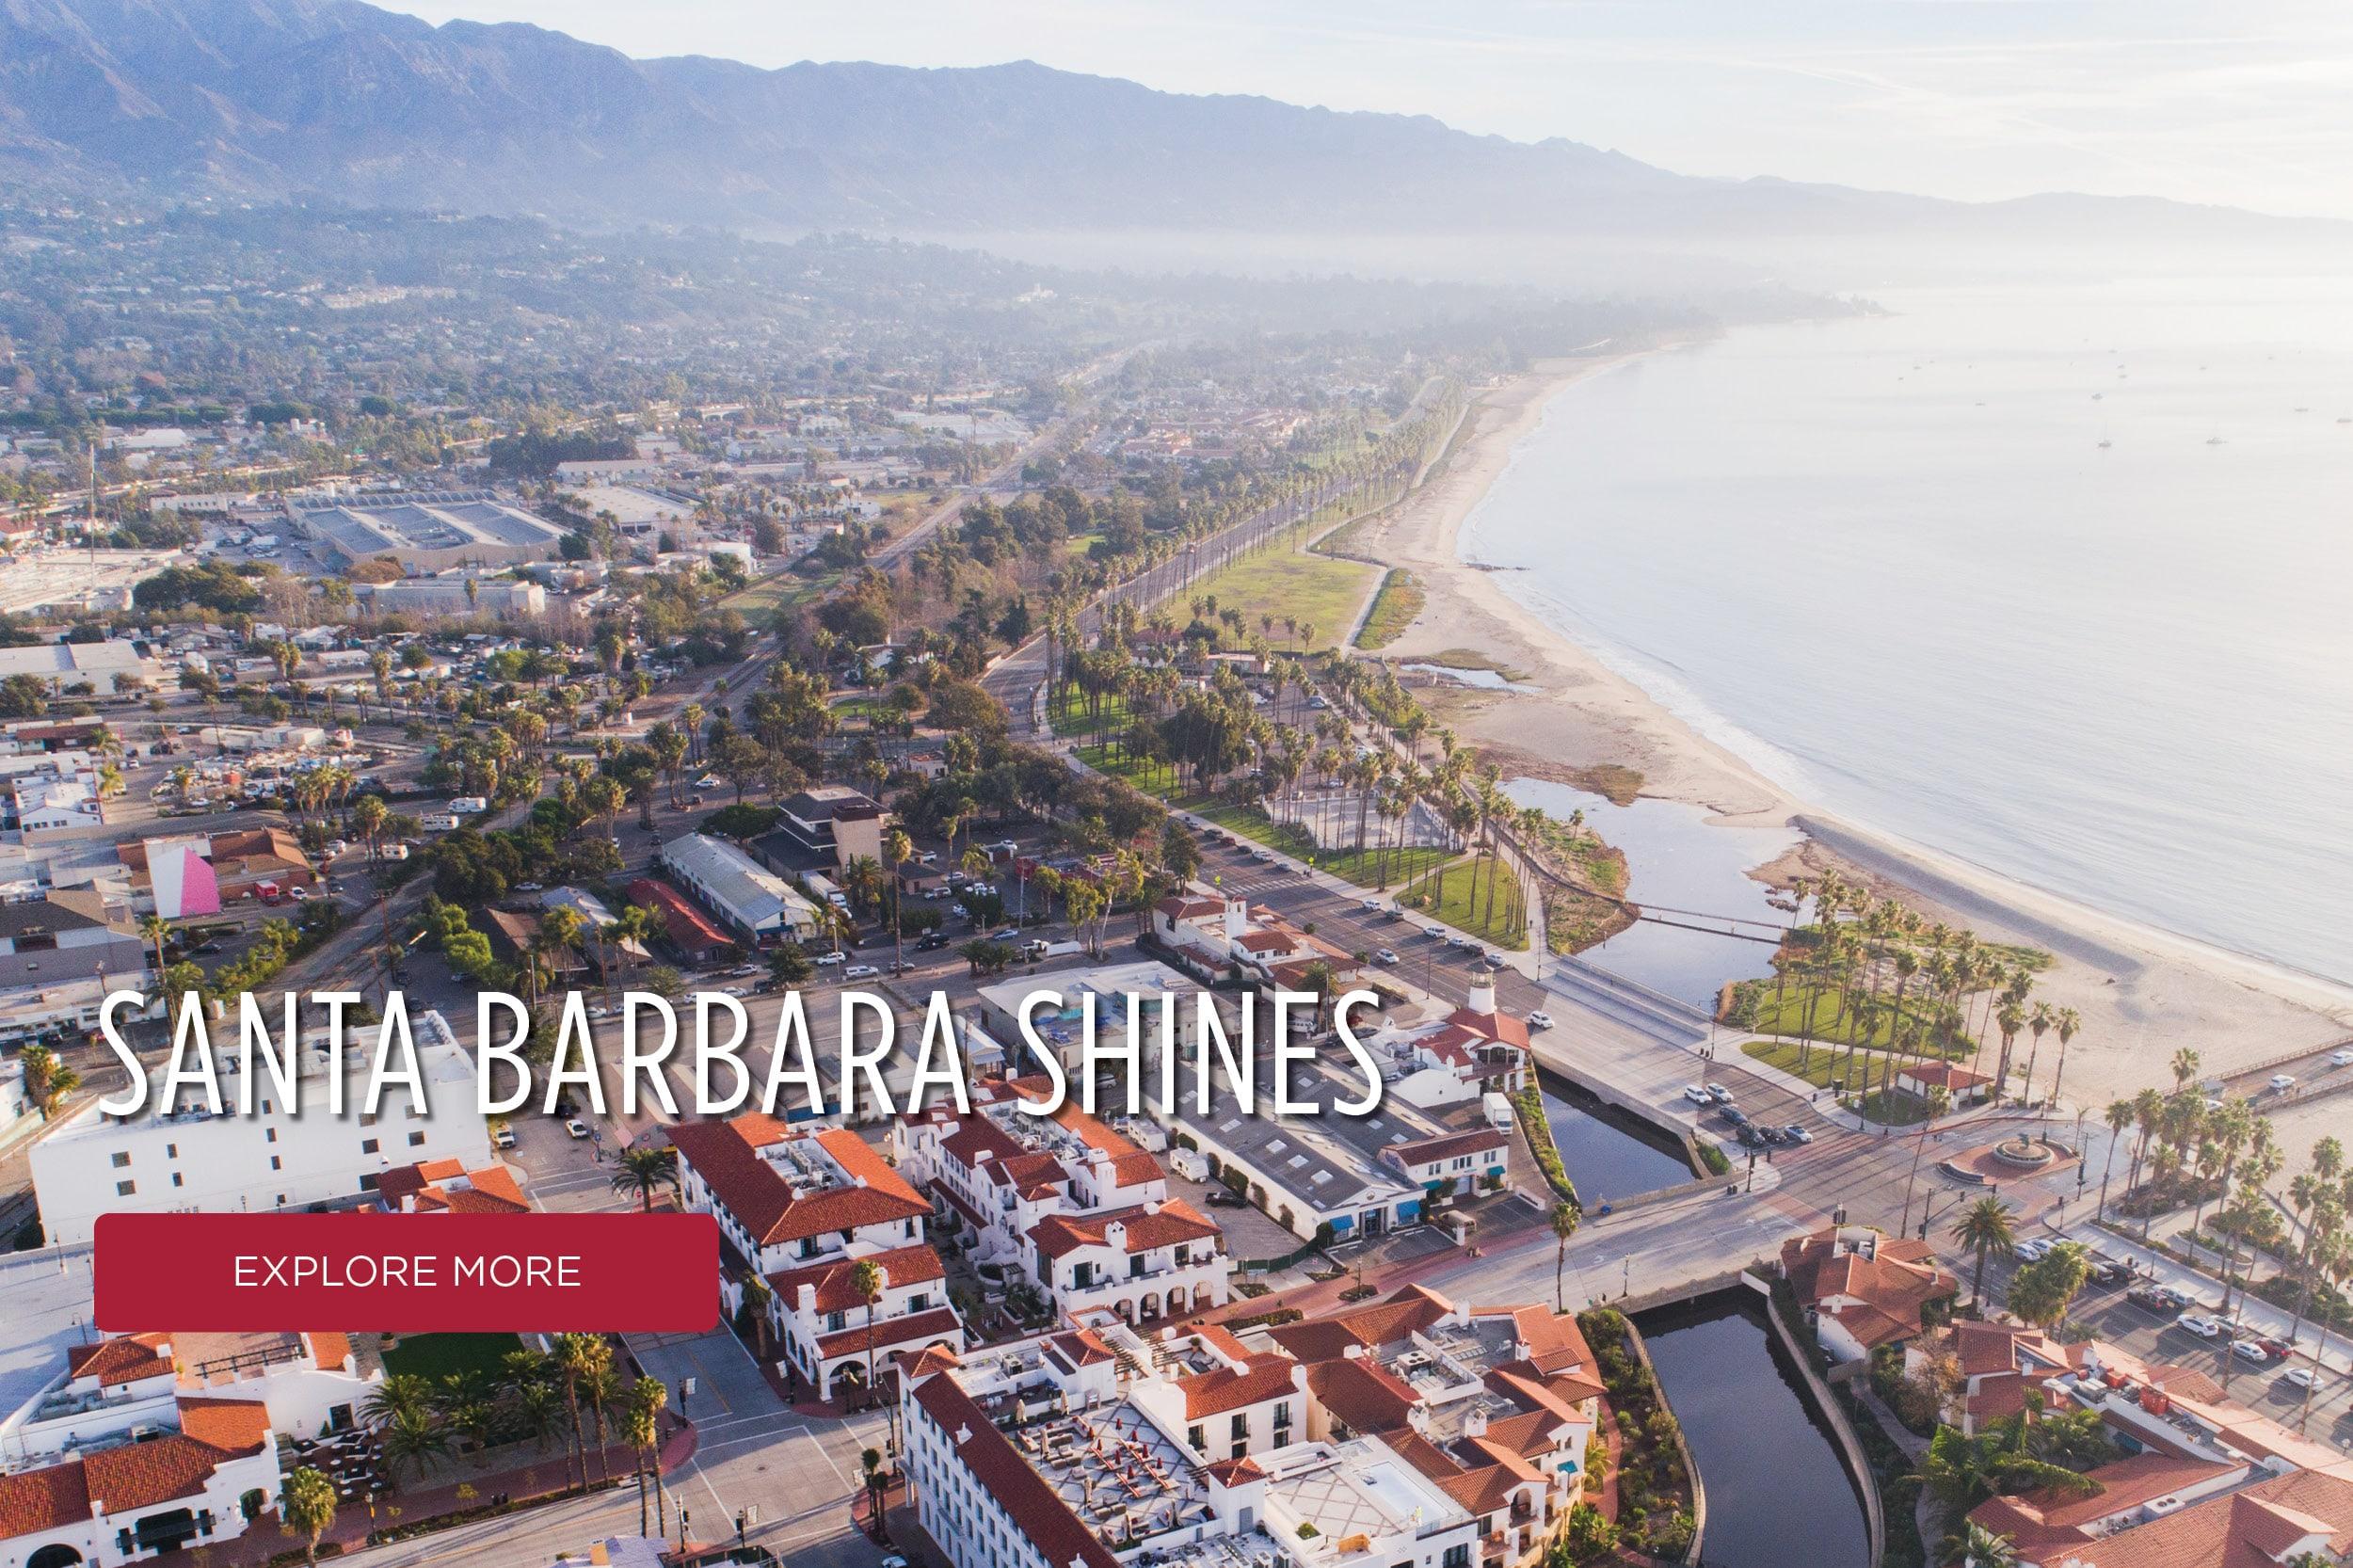 Santa Barbara, CA   Hotels, Restaurants, Events & Activities